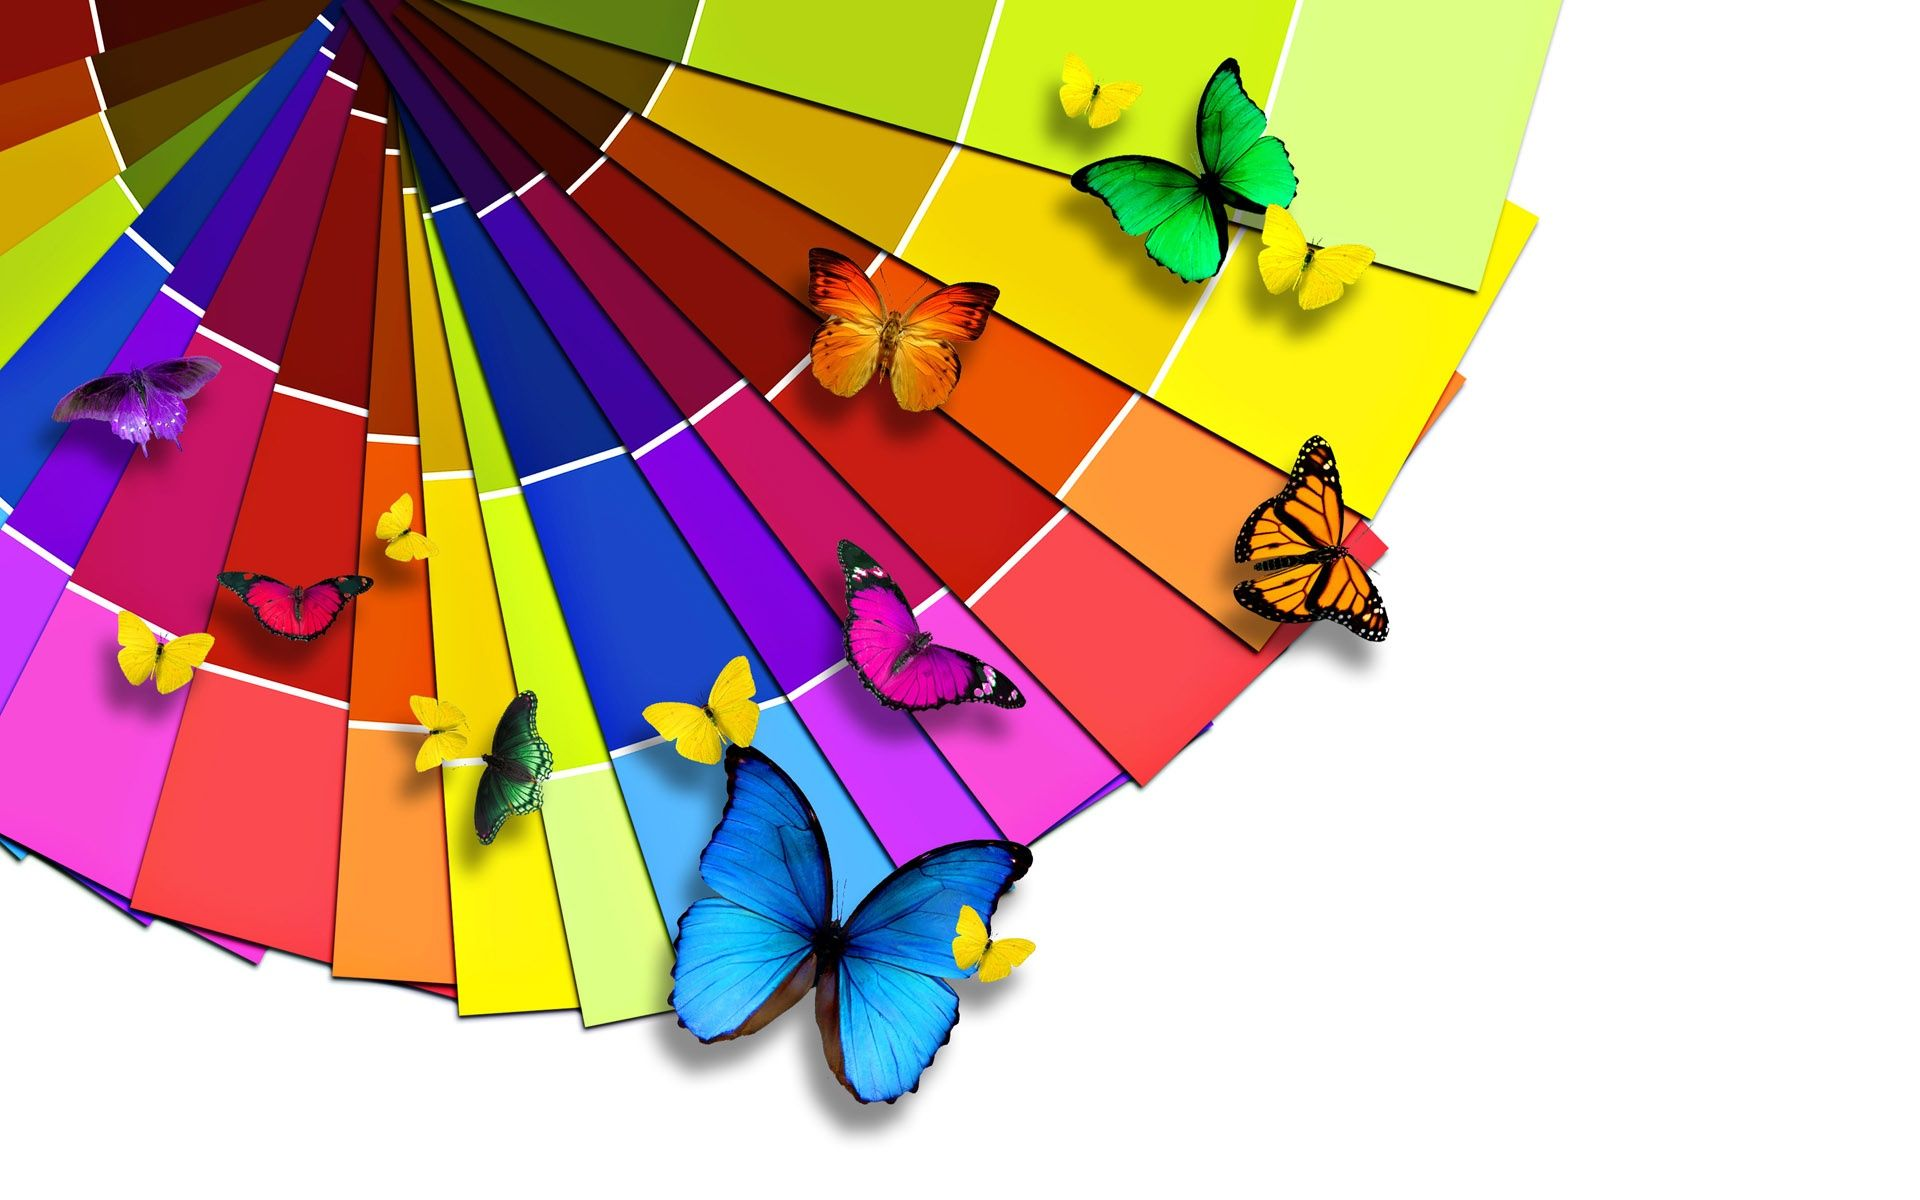 Colorful Butterflies - Colorful Butterflies Wallpaper Rainbow Coloursbright